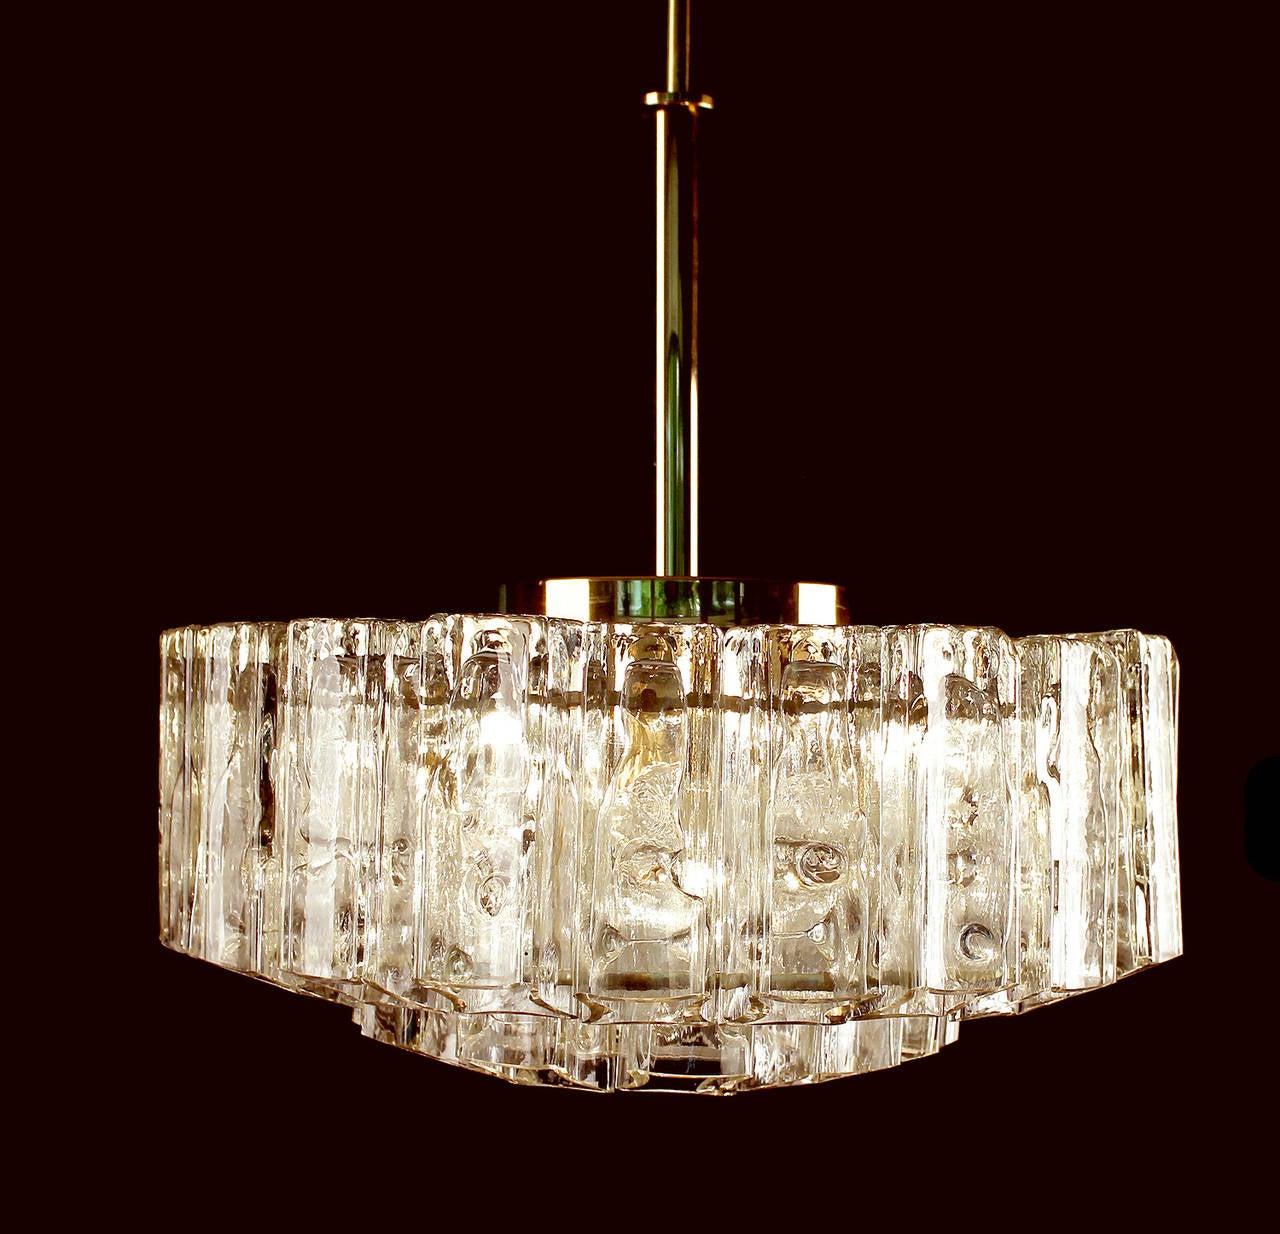 Doria crystal chandelier suspension lustre lampara for Lustre double suspension